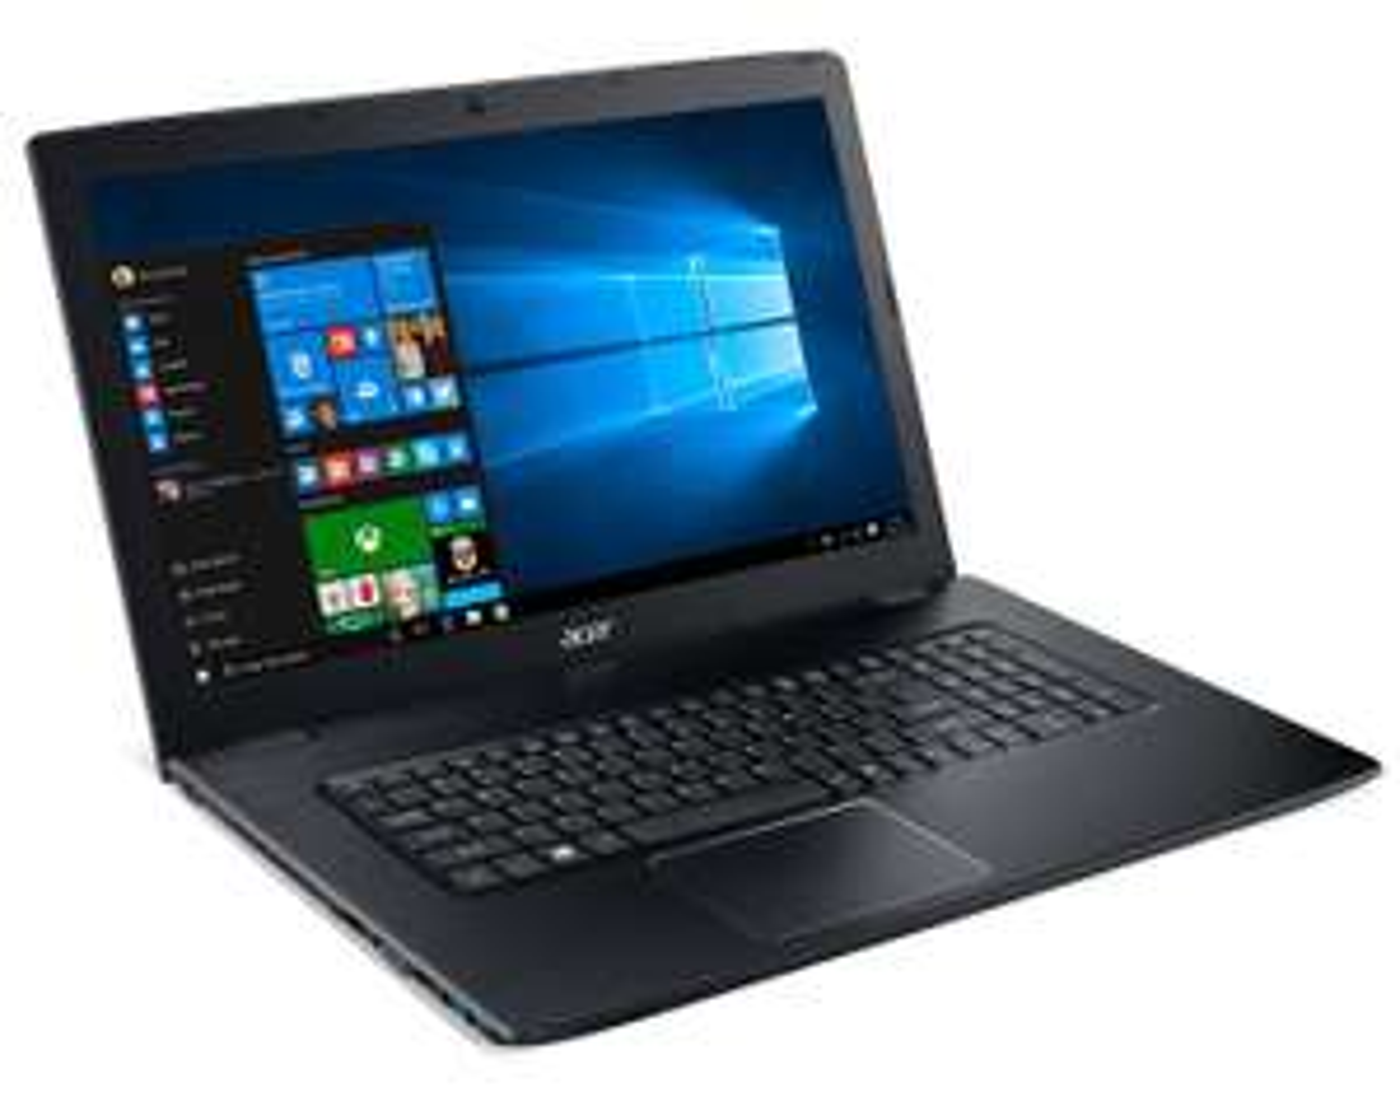 "PC Portable 17.3"" HD+  Acer E5-774G-77JM - Intel i7-6500U, RAM 4 Go, HDD 1 To, GTX 950M"